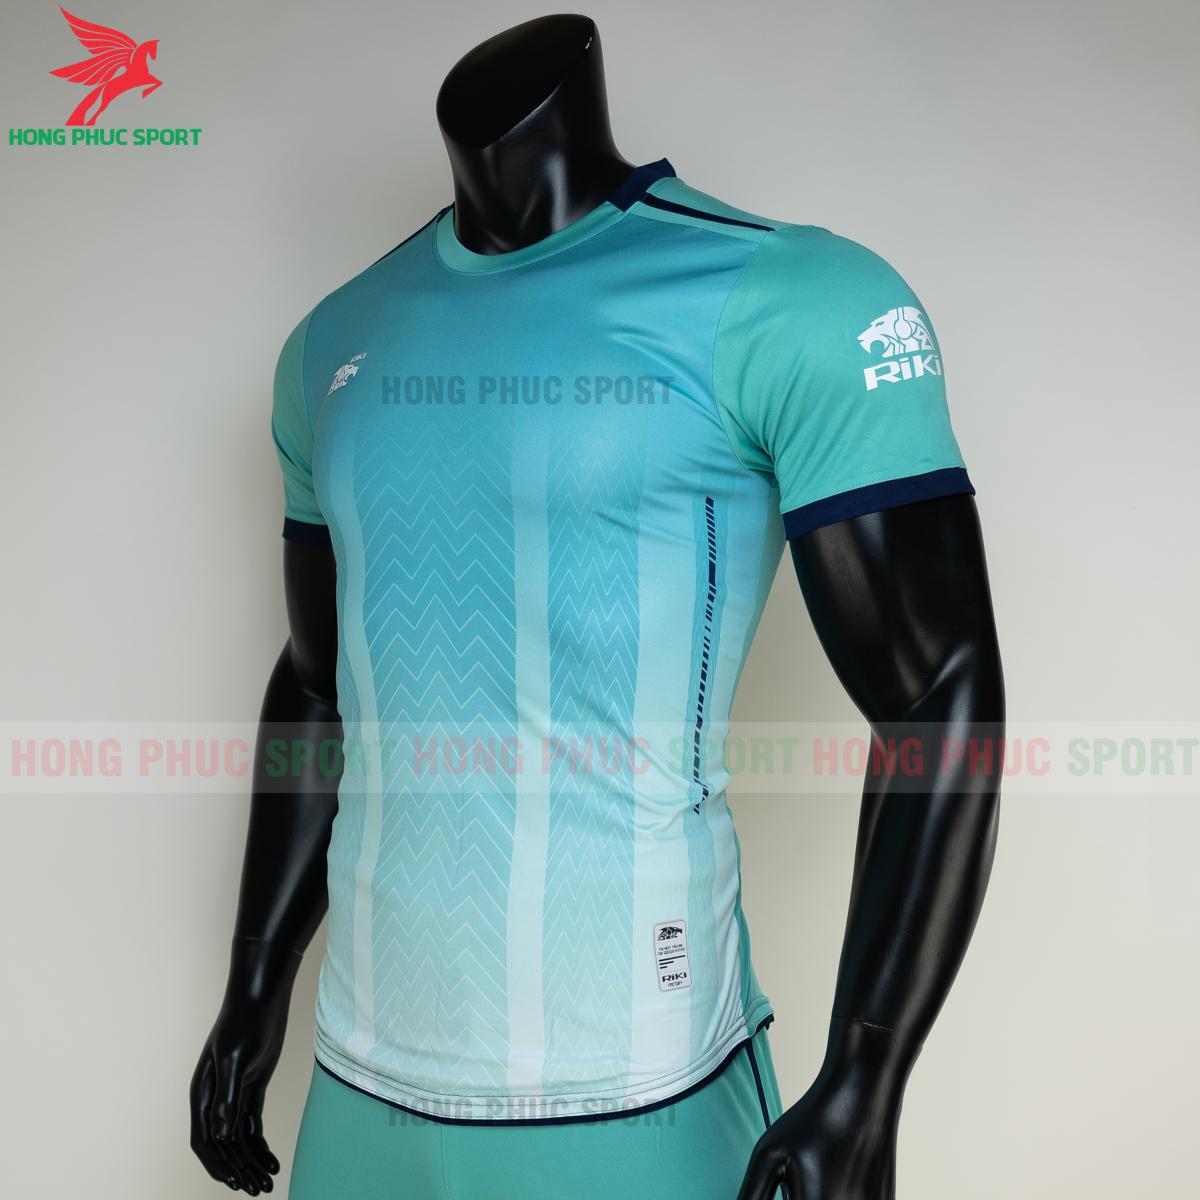 https://cdn.hongphucsport.com/unsafe/s4.shopbay.vn/files/285/ao-bong-da-khong-logo-riki-furior-mau-xanh-ngoc-3-60501a2086aeb.png